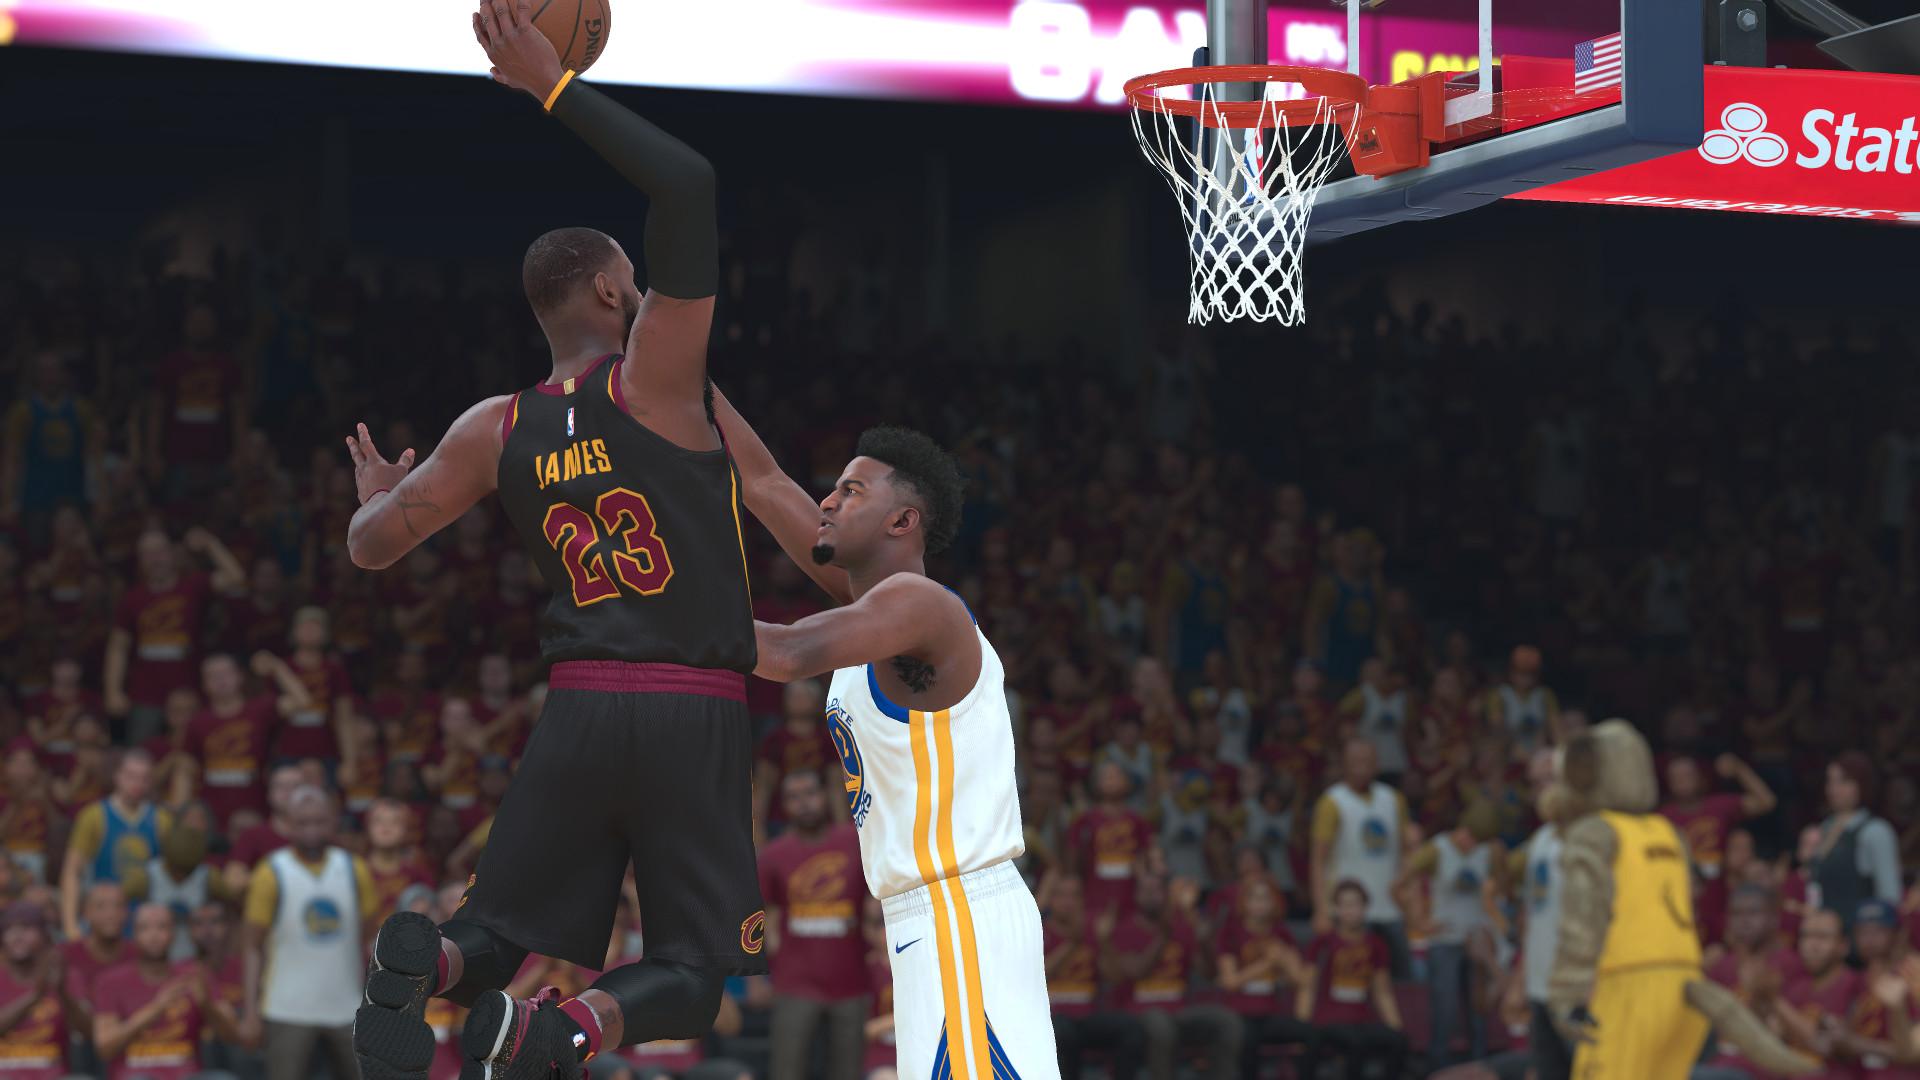 NBA 2K18 LeBron James dunk NBA Finals